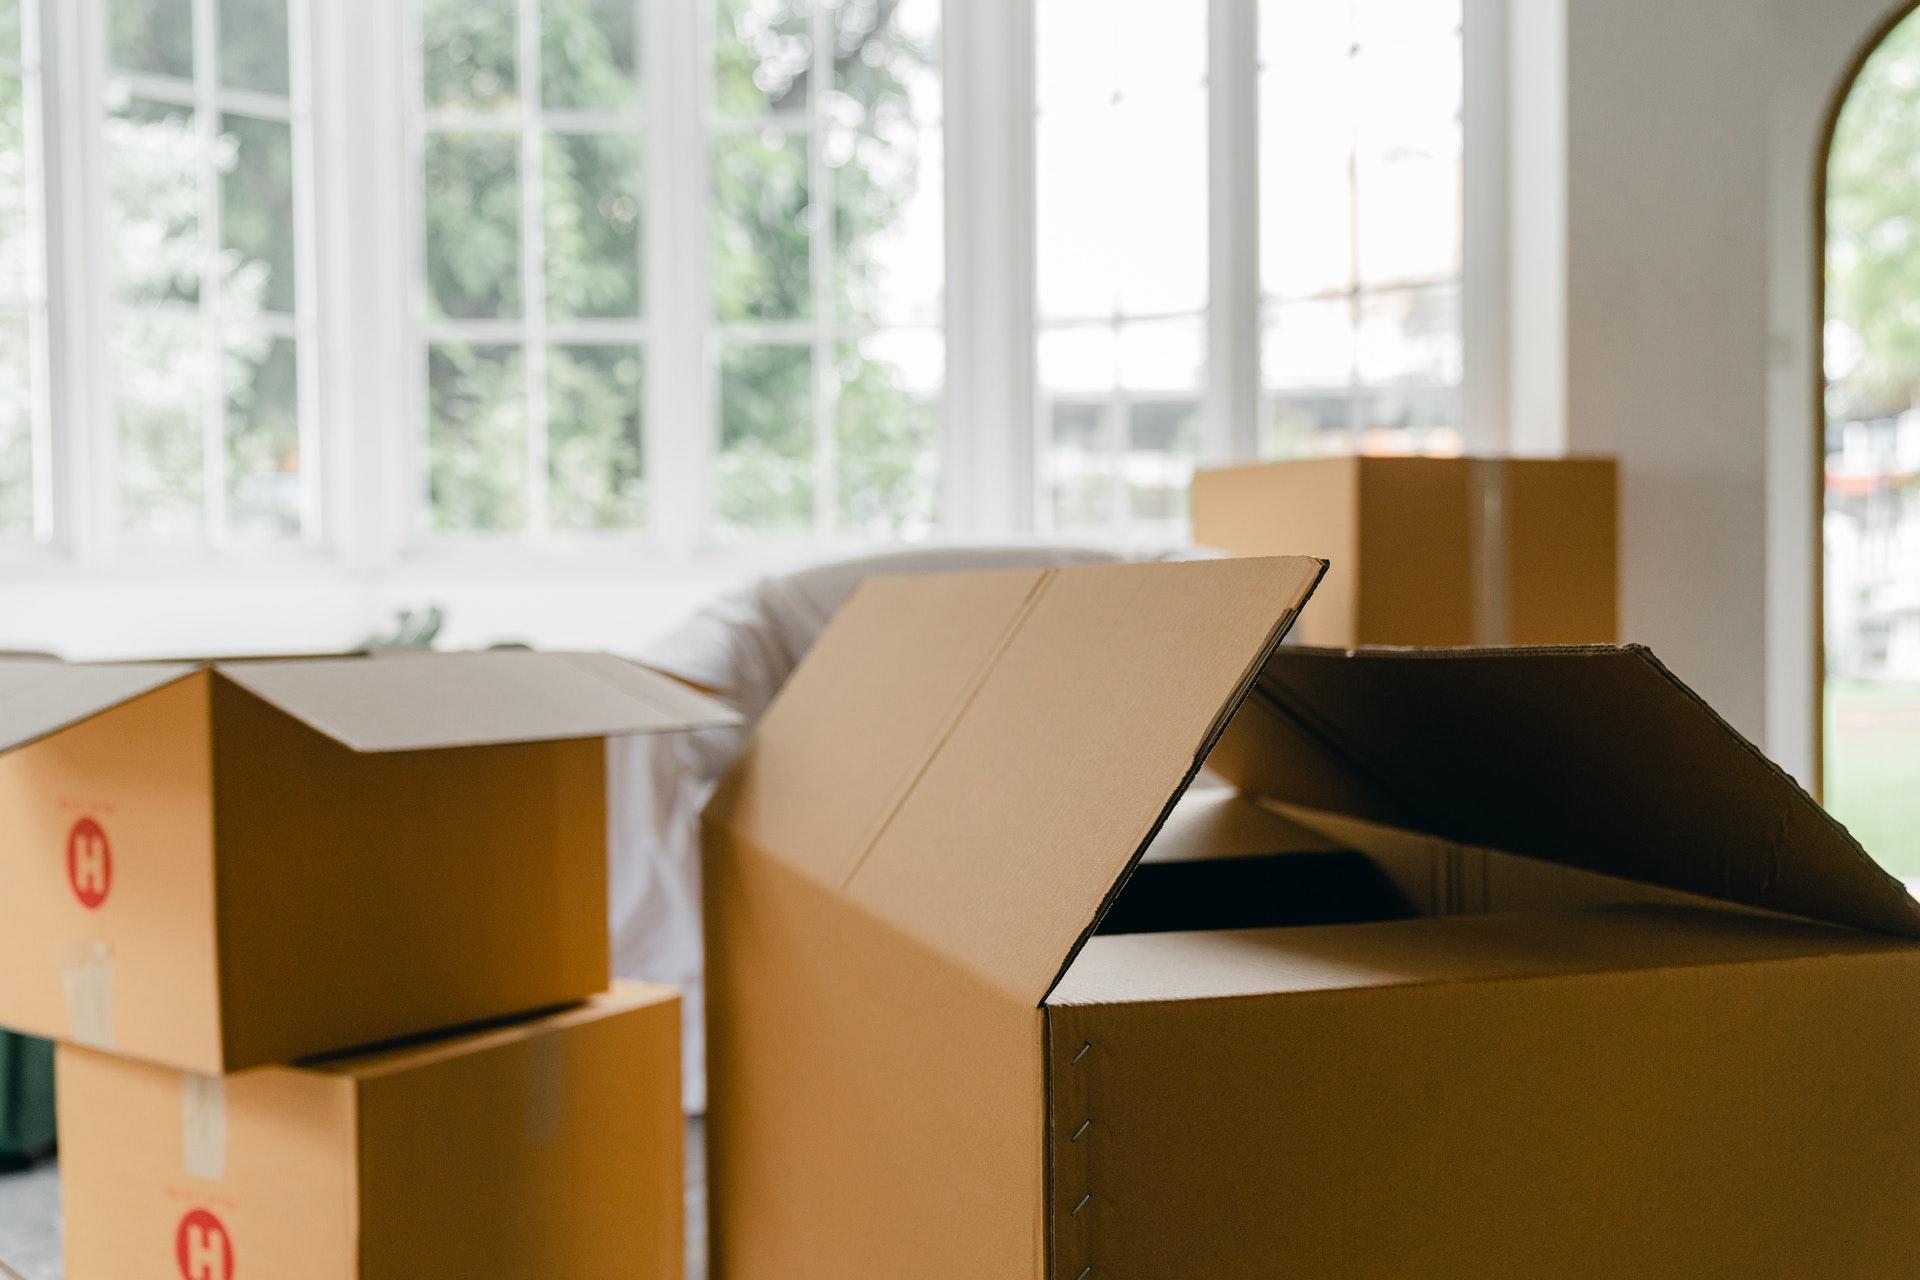 5 Reasons to Move Your Family to Arizona